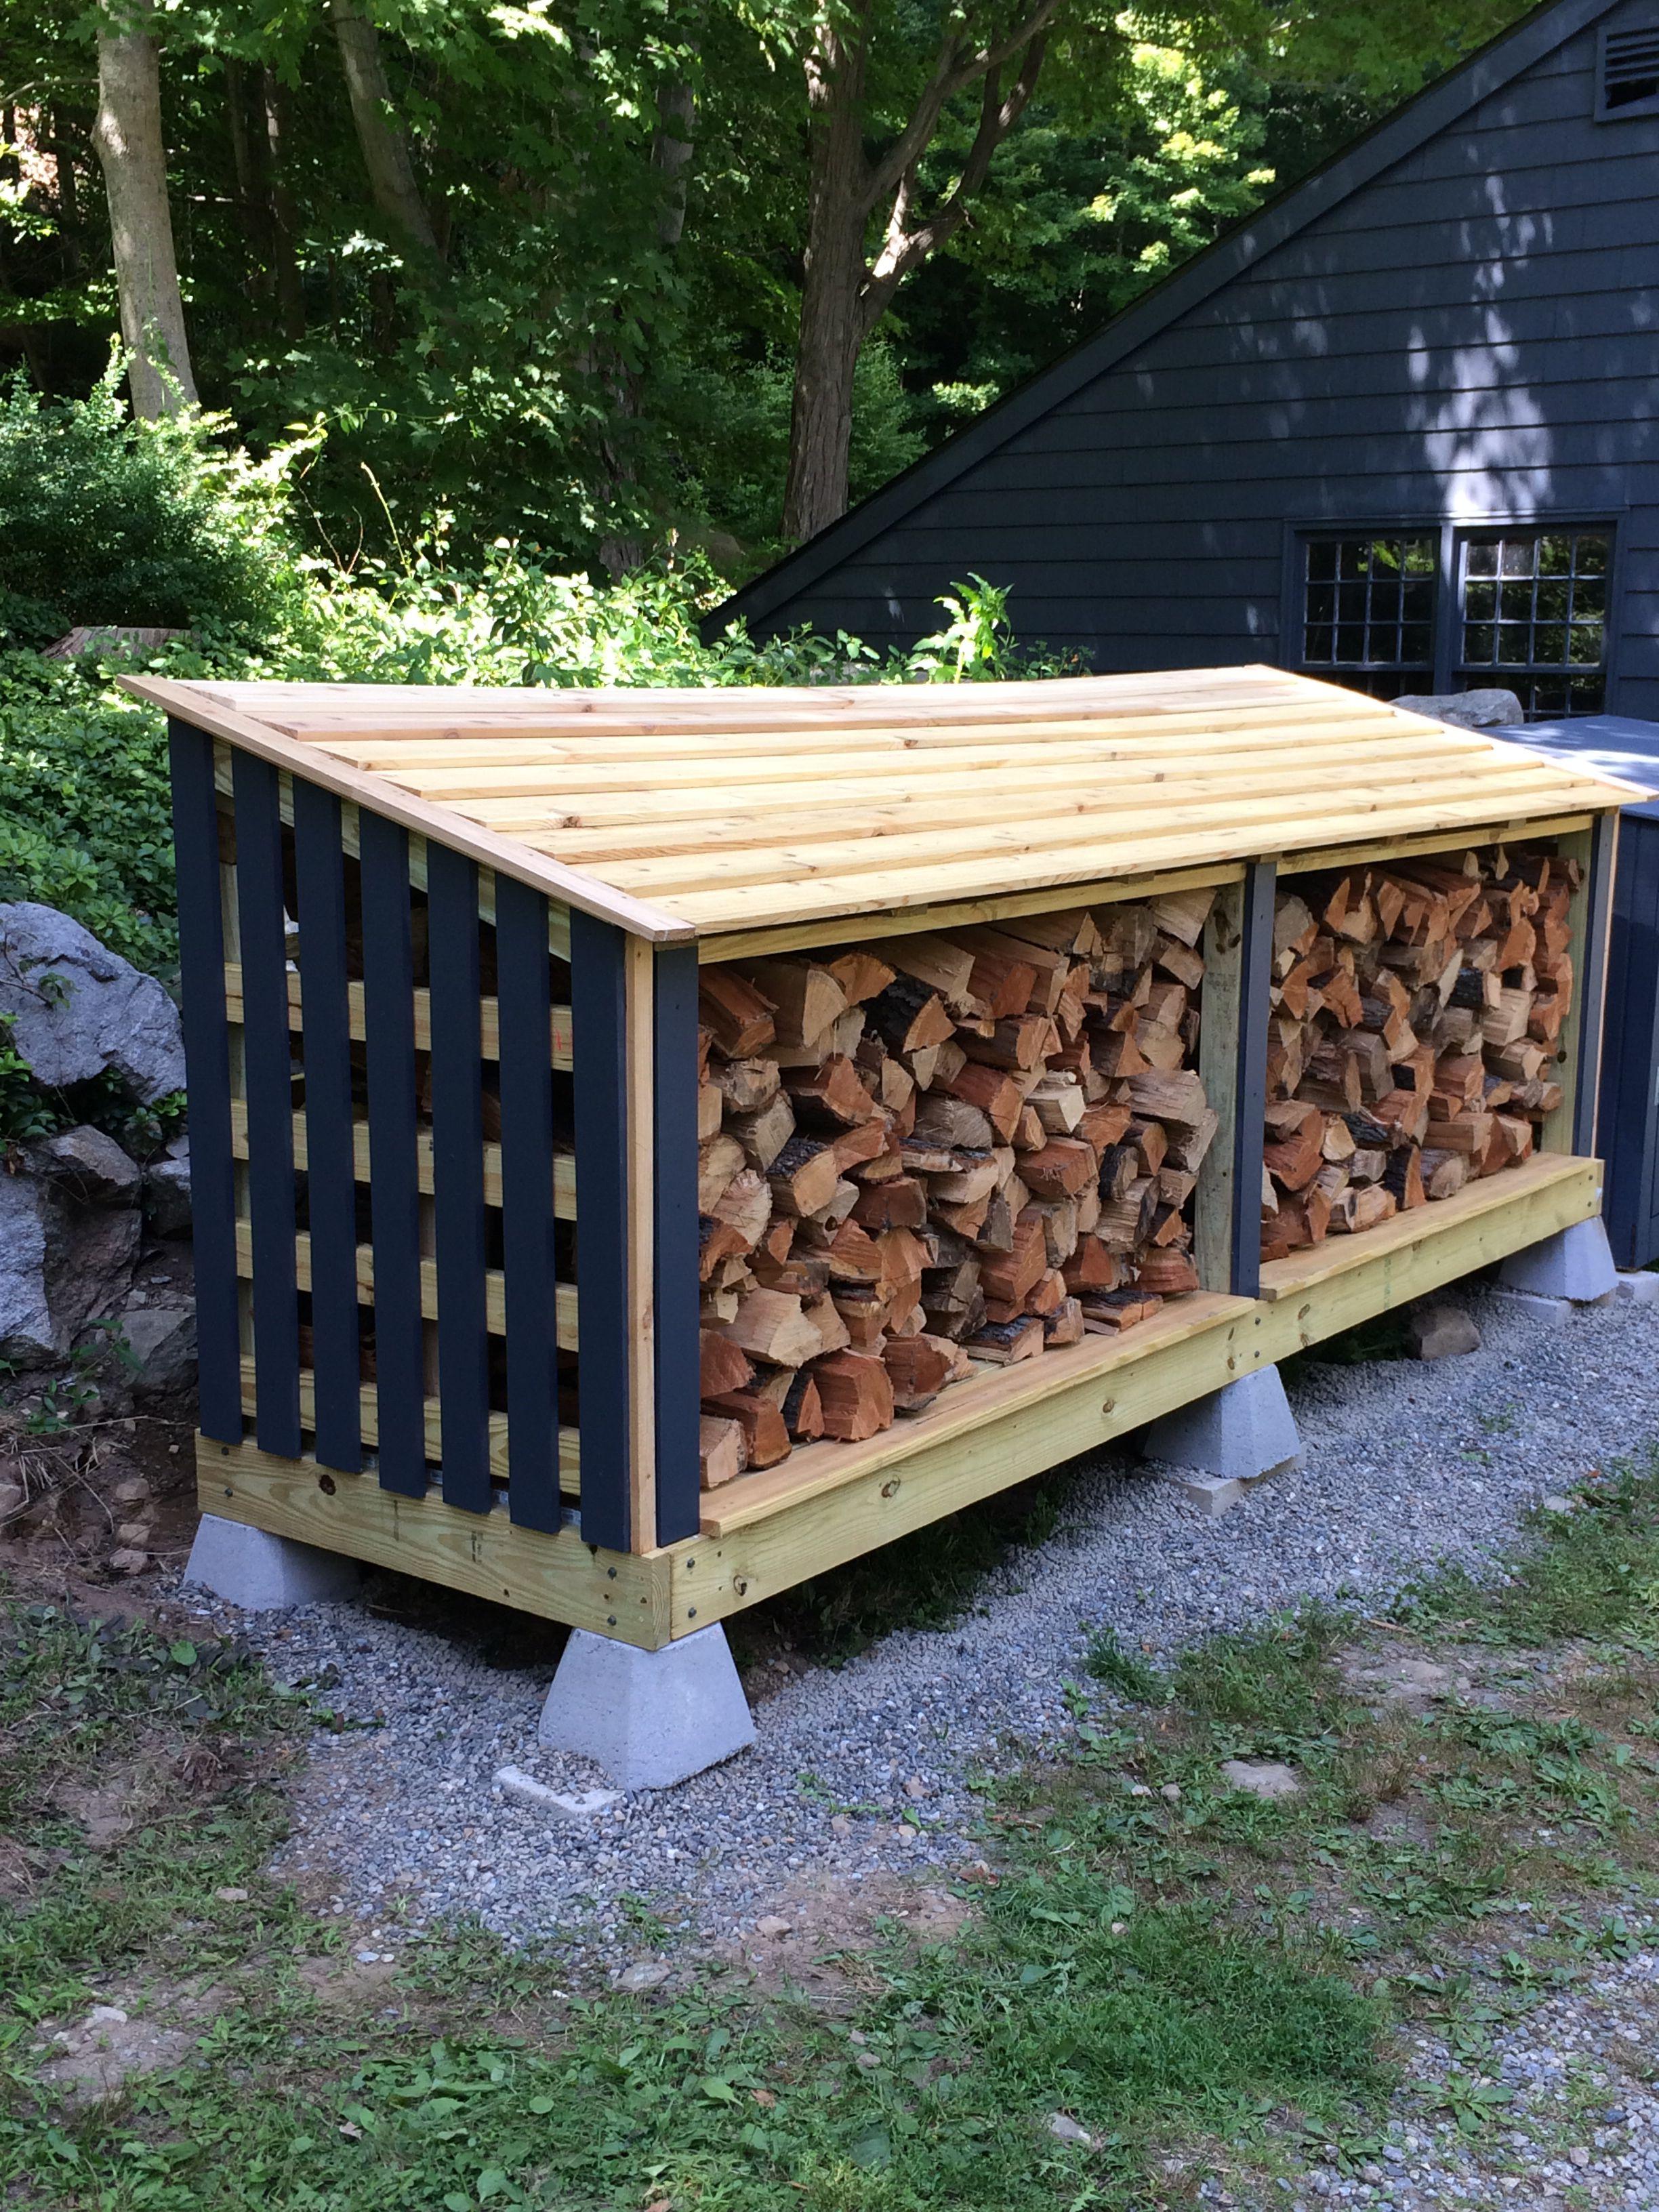 Fire Wood Shed Outdoor Firewood Rack Firewood Shed Backyard Sheds